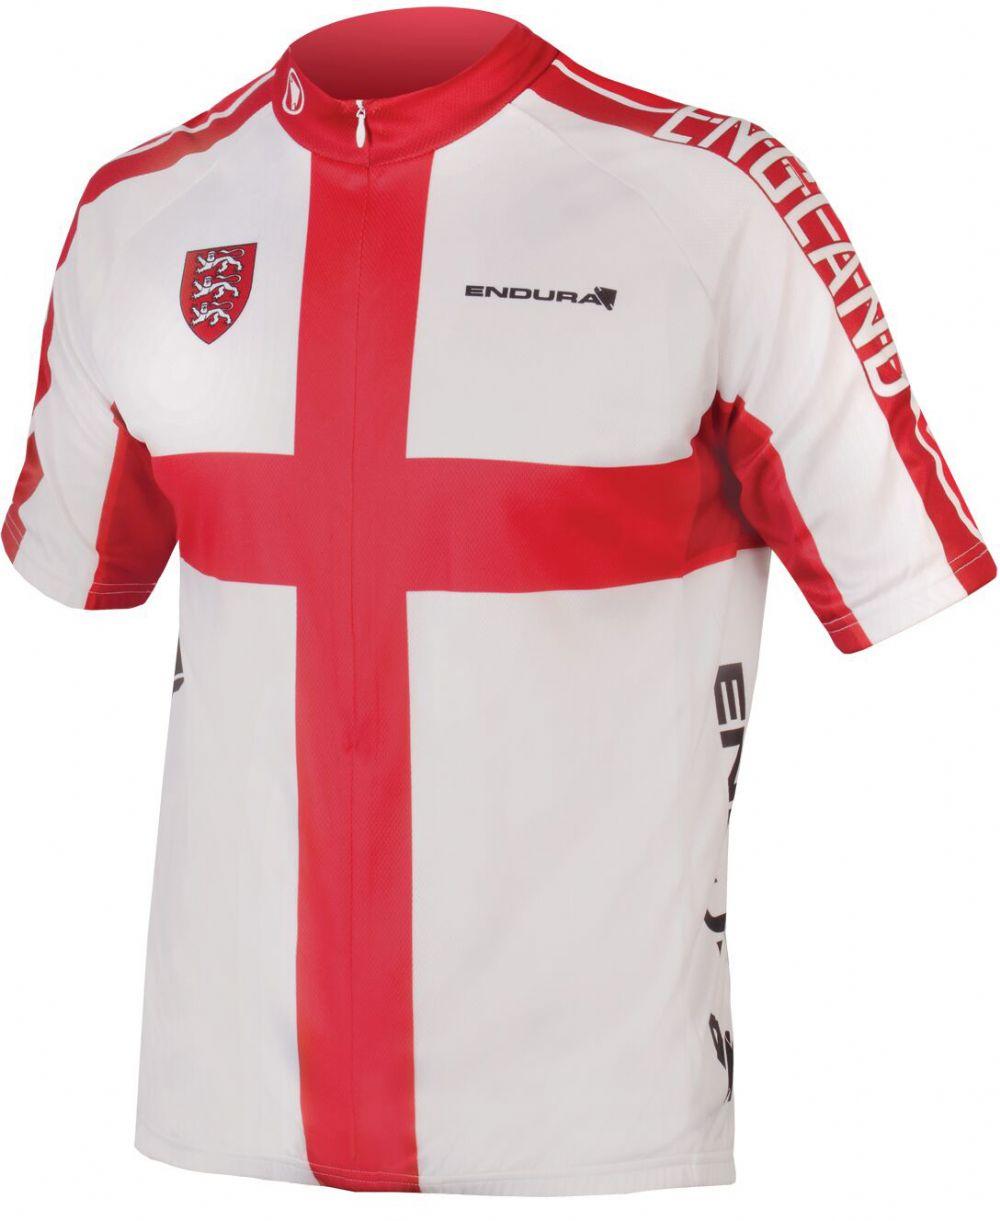 Endura Coolmax Printed England Jersey 2 - £23.99  0b80e8e80